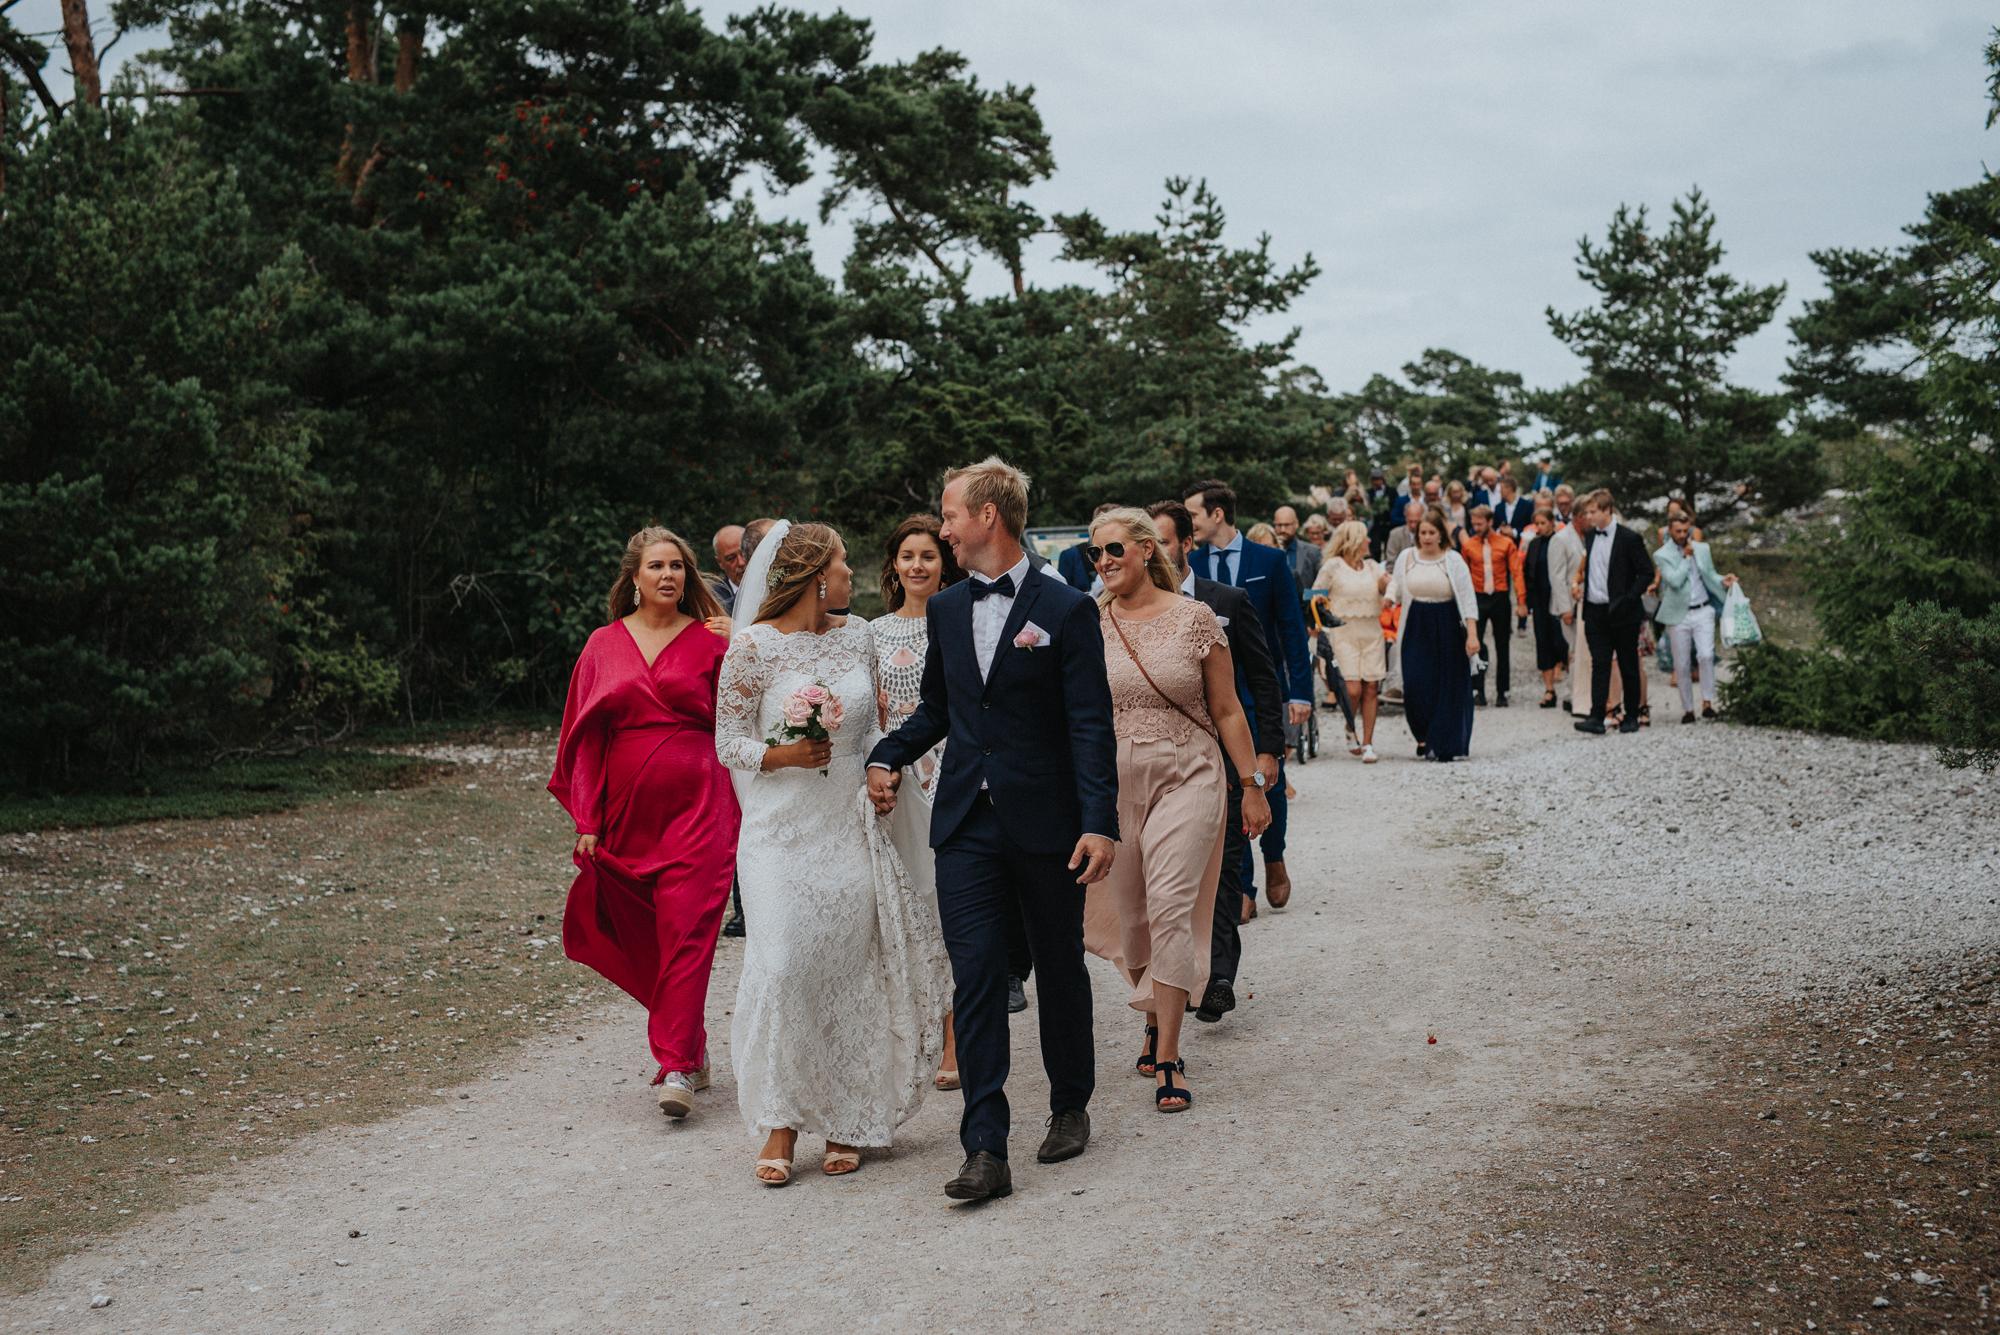 044-bröllopsfotograf-folhammar-gotland-neas-fotografi.jpg